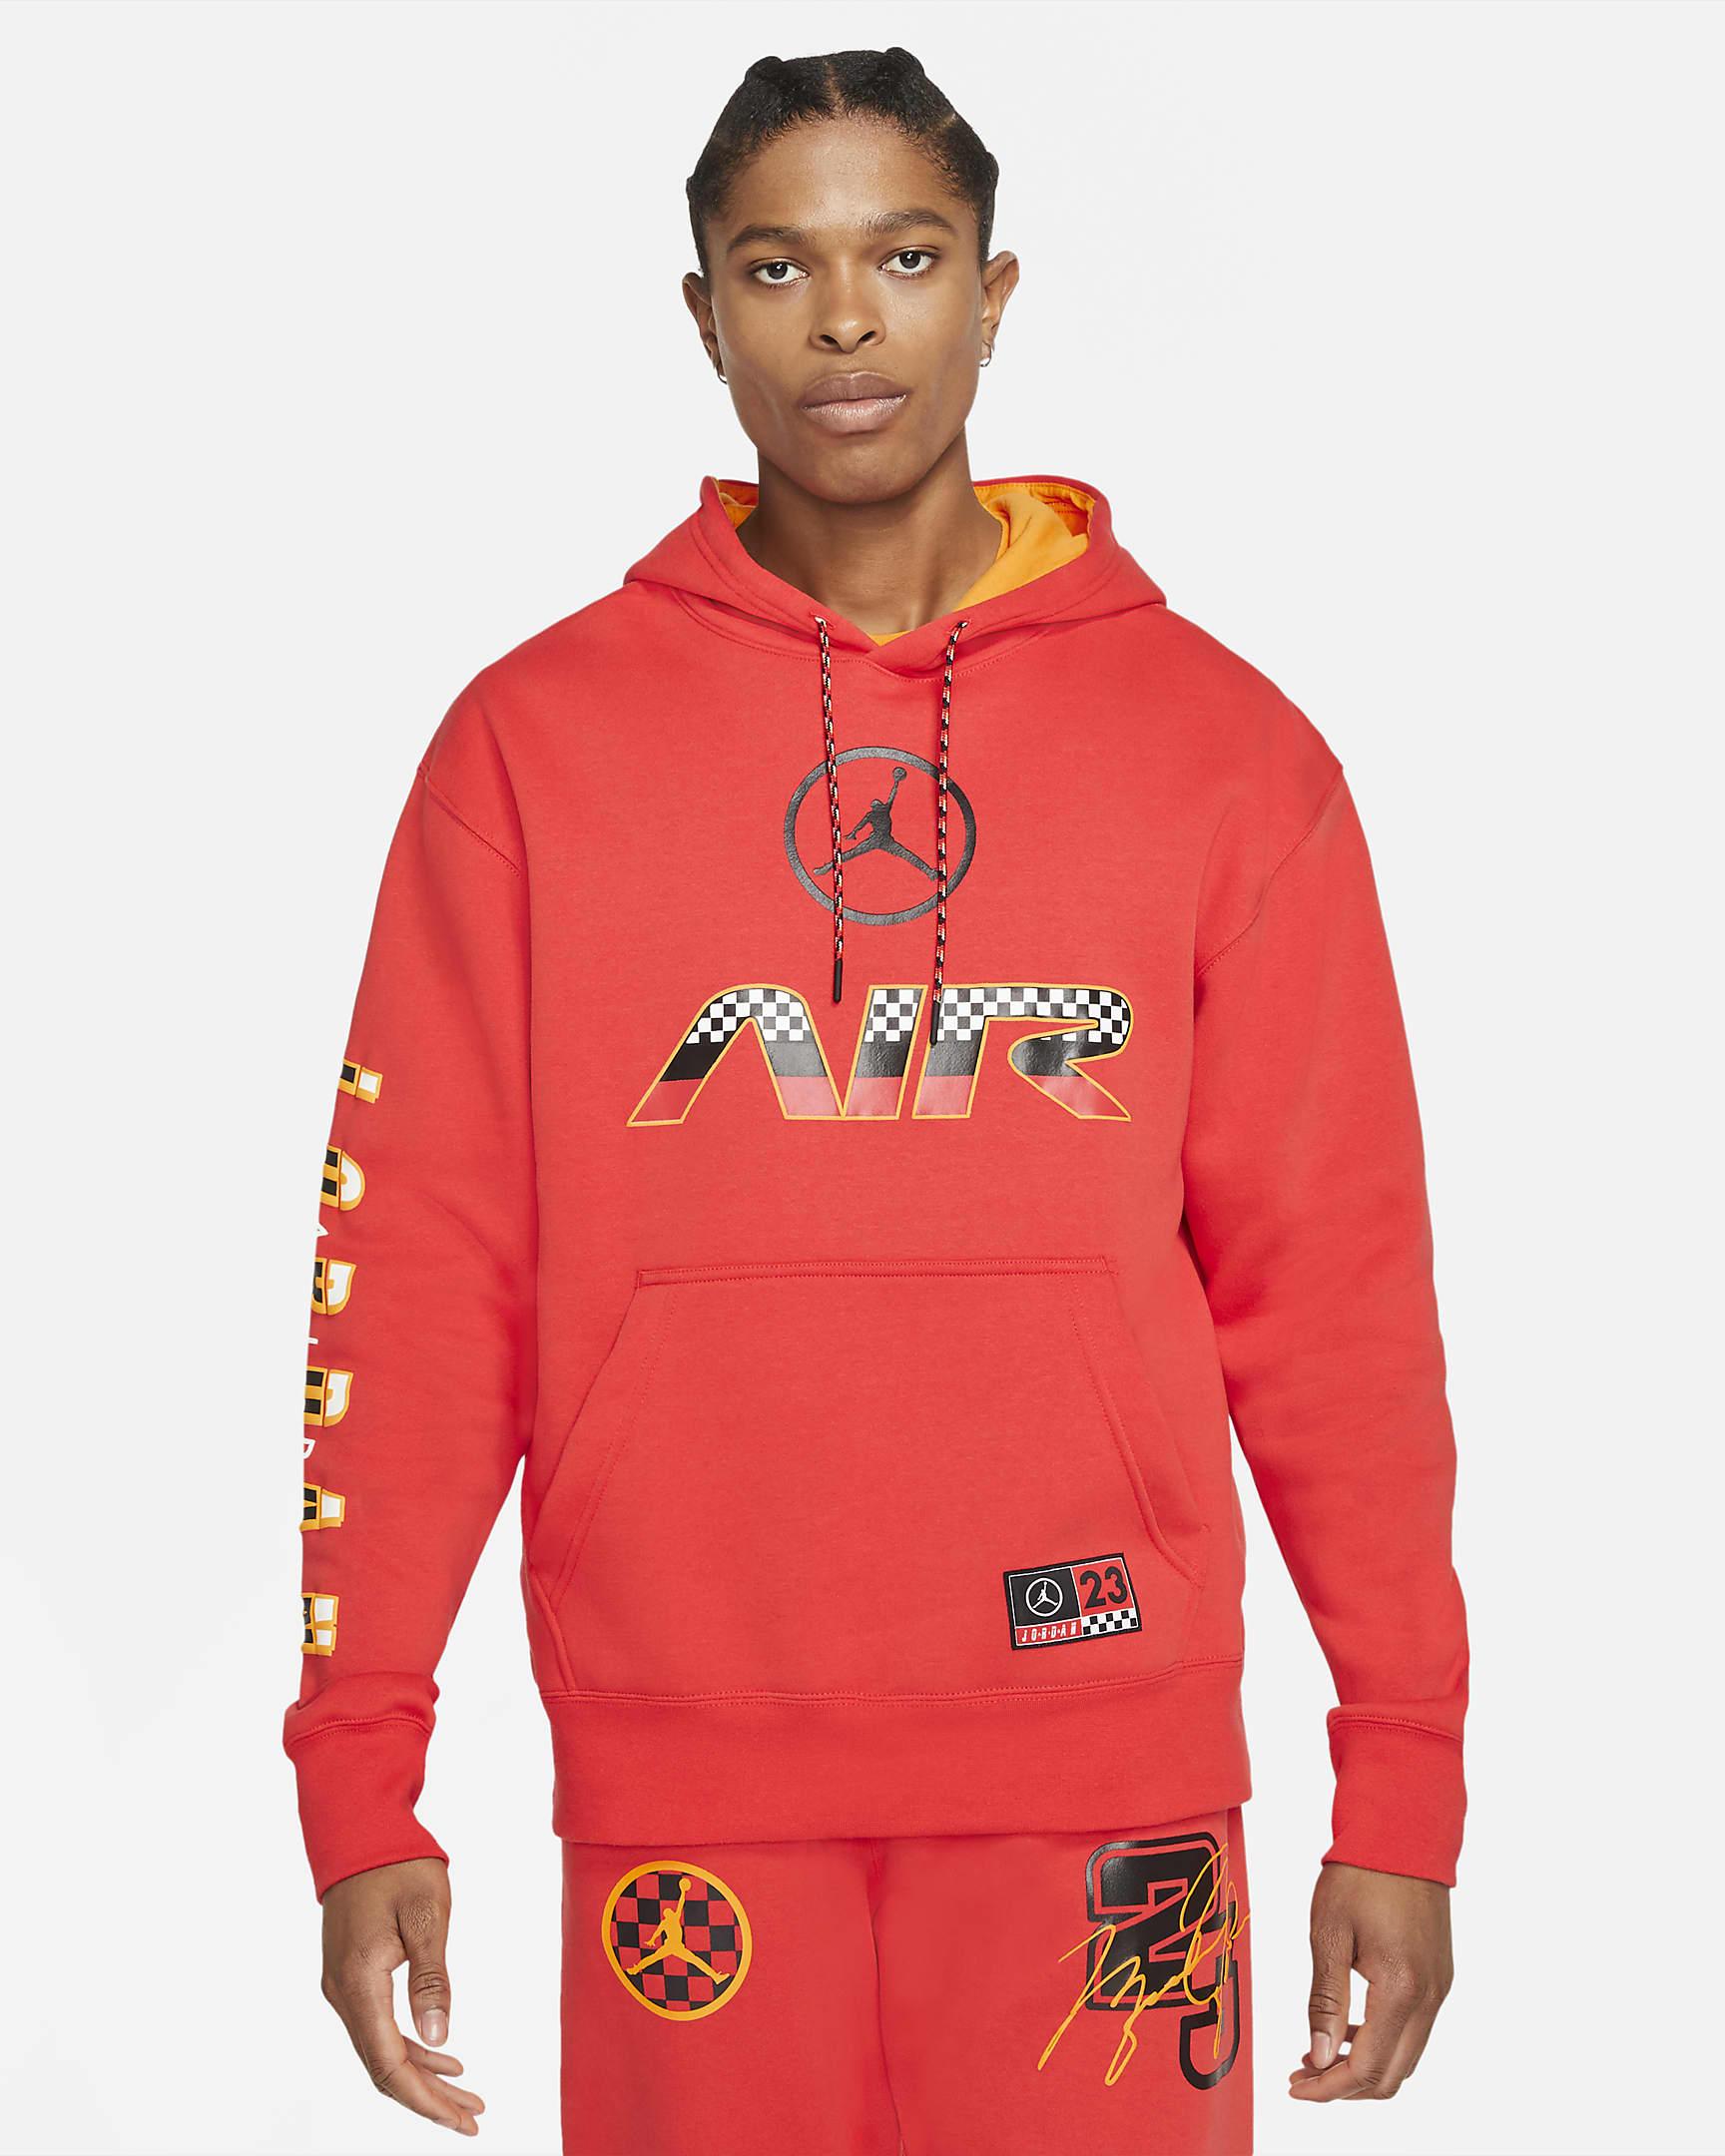 jordan-sport-dna-mens-hbr-pullover-hoodie-1SFRQ0-5